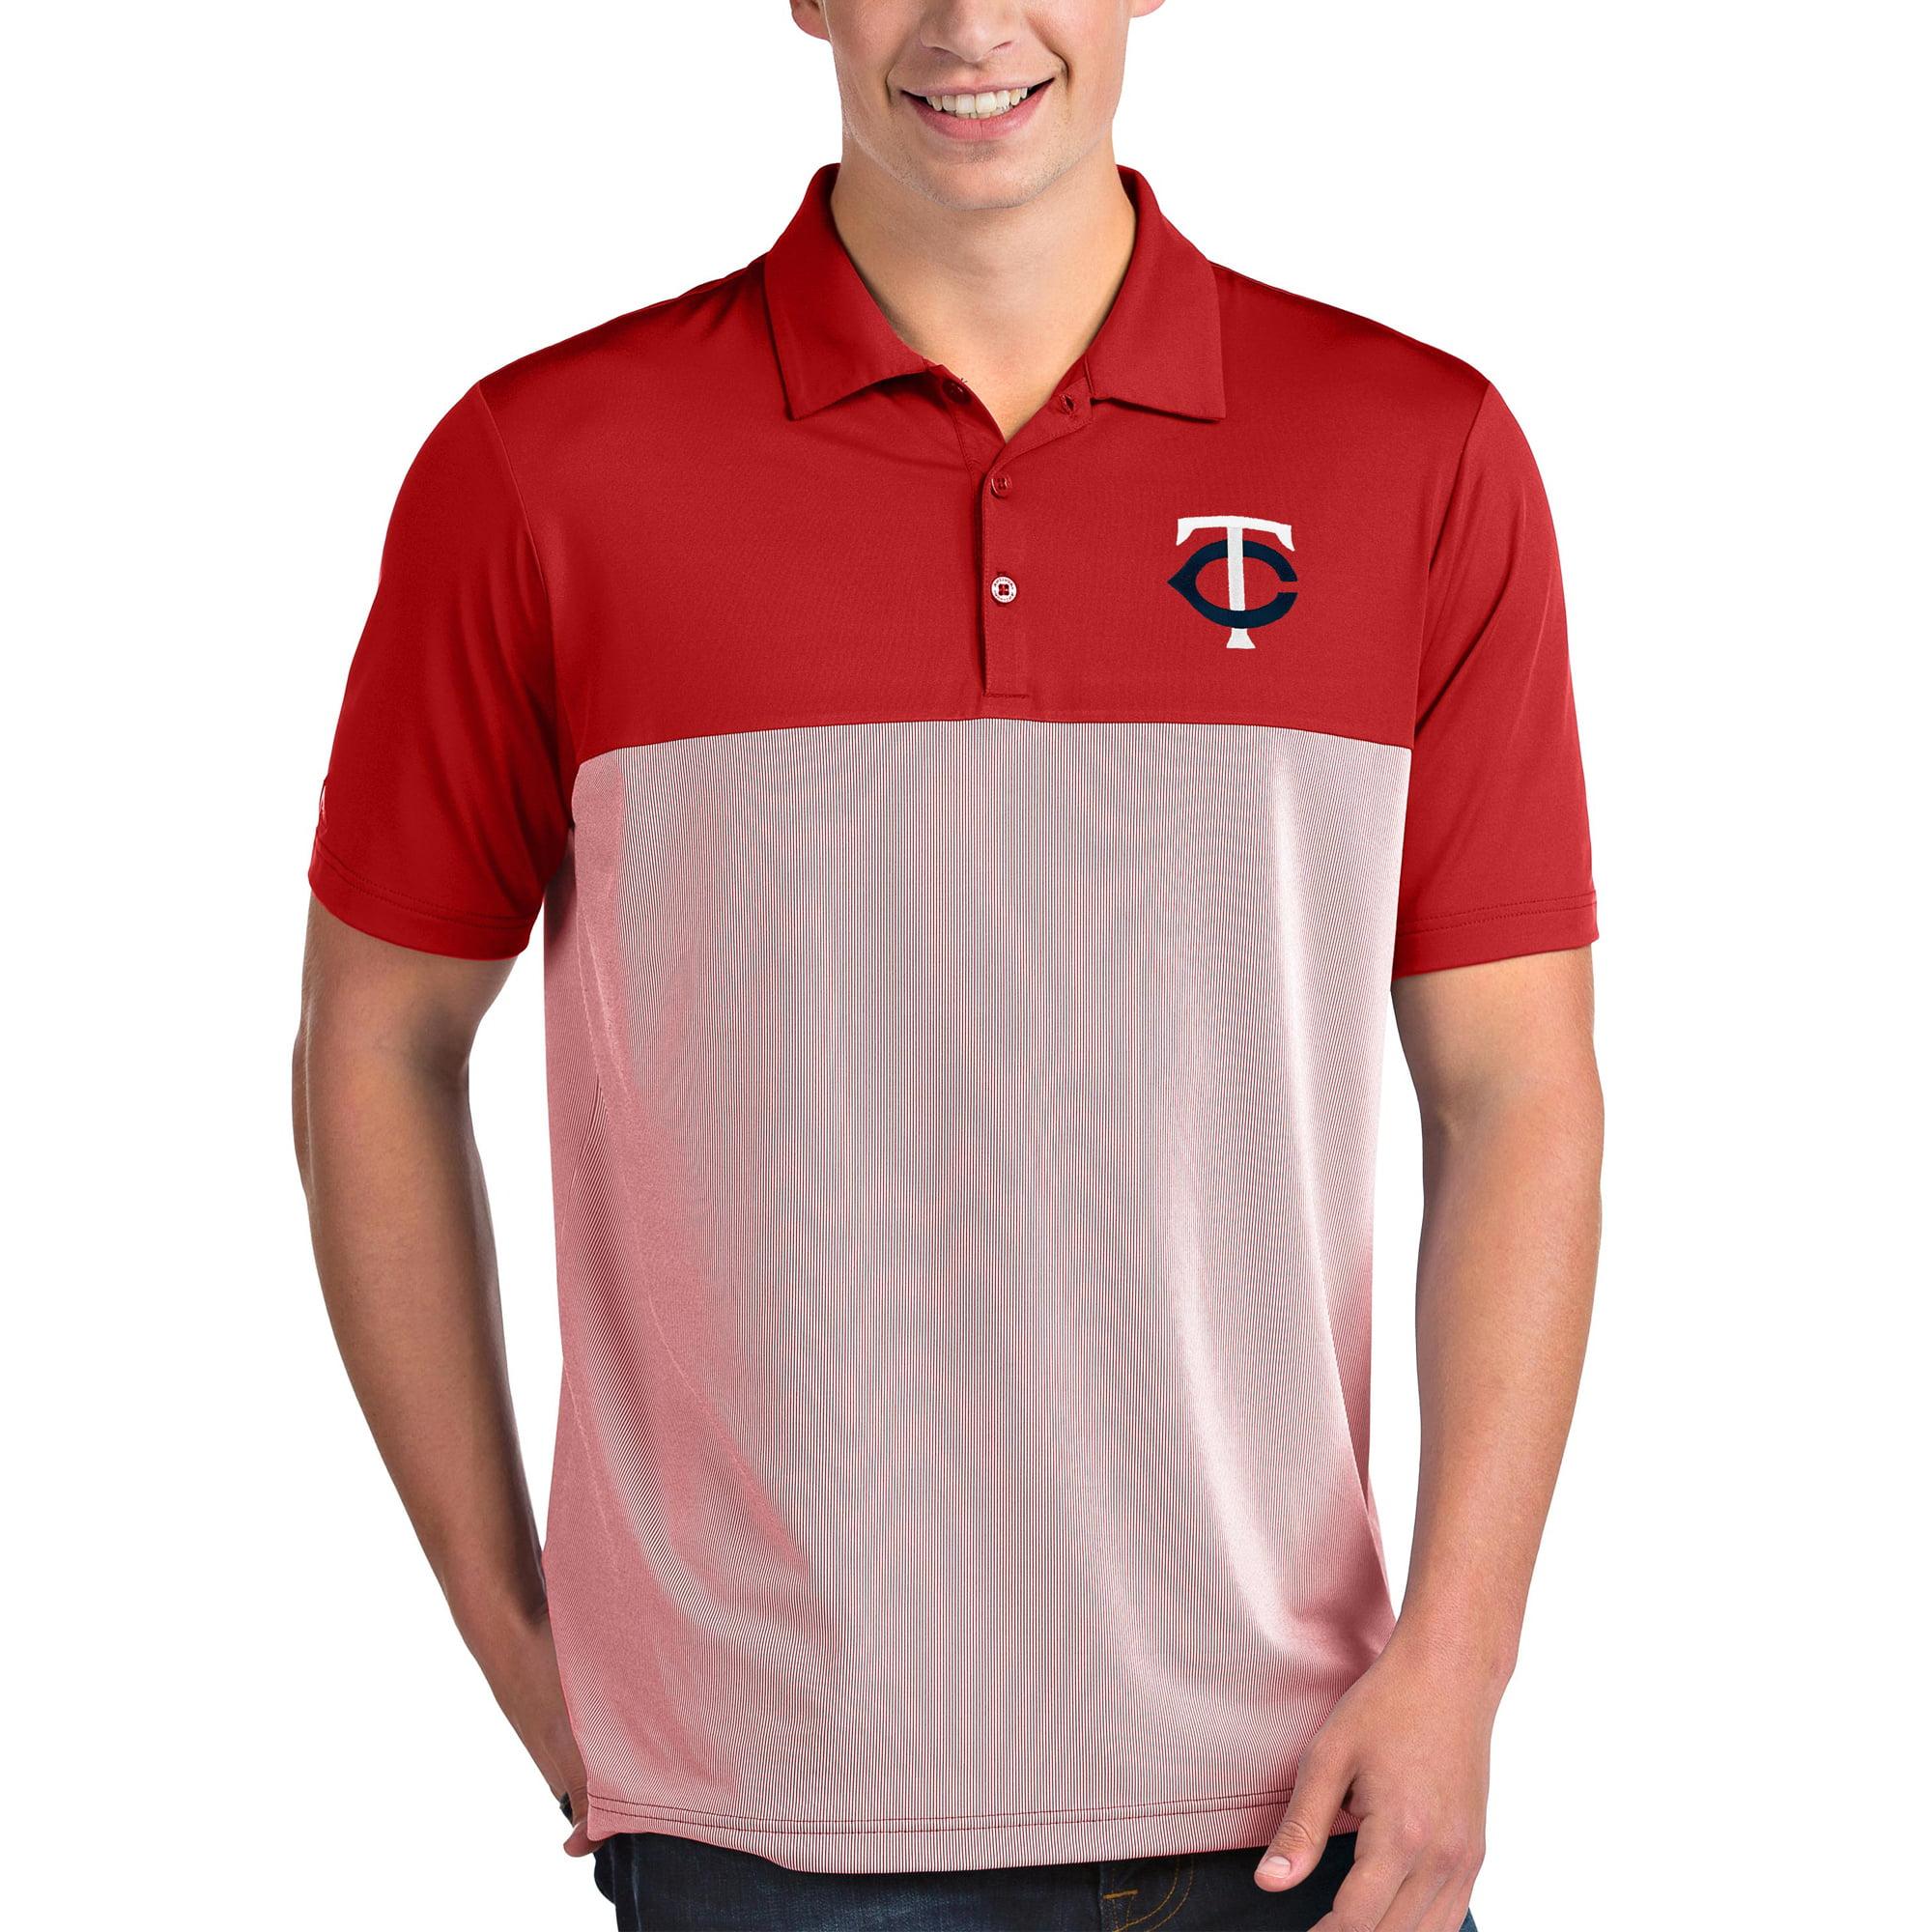 Minnesota Twins Antigua Venture Polo - Red/White